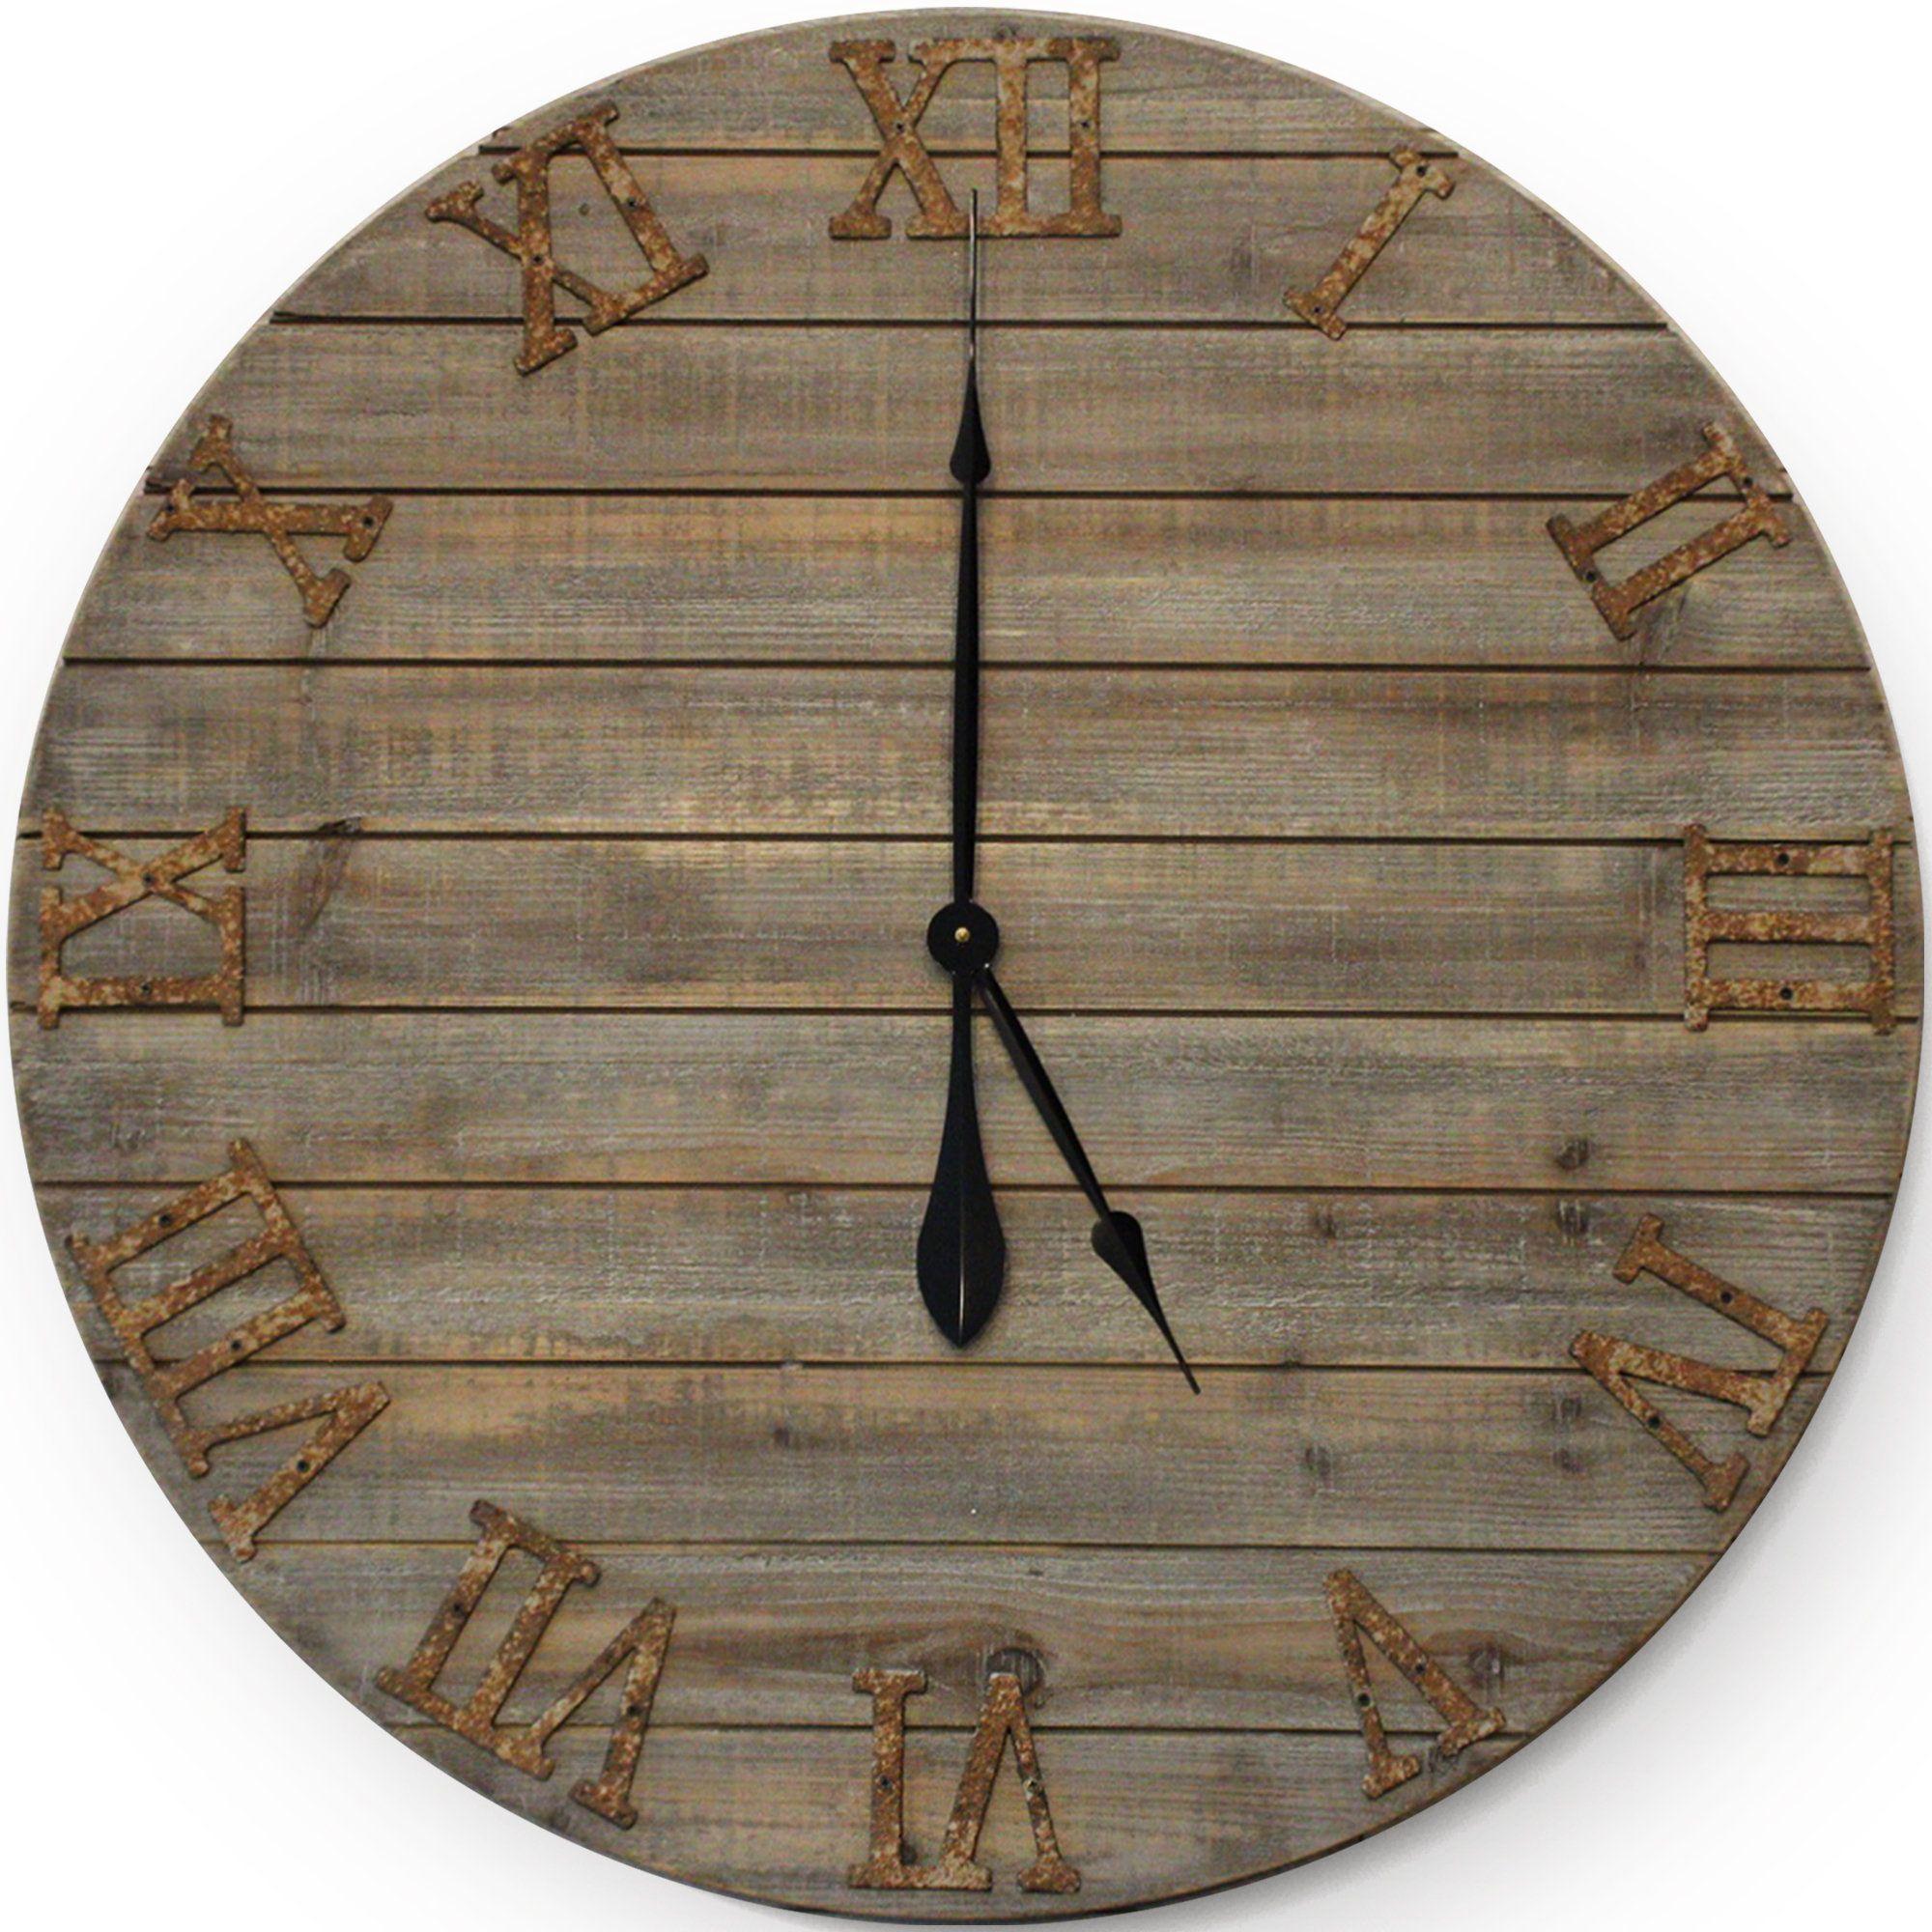 30in large farmhouse wall clock handmade oversized wood